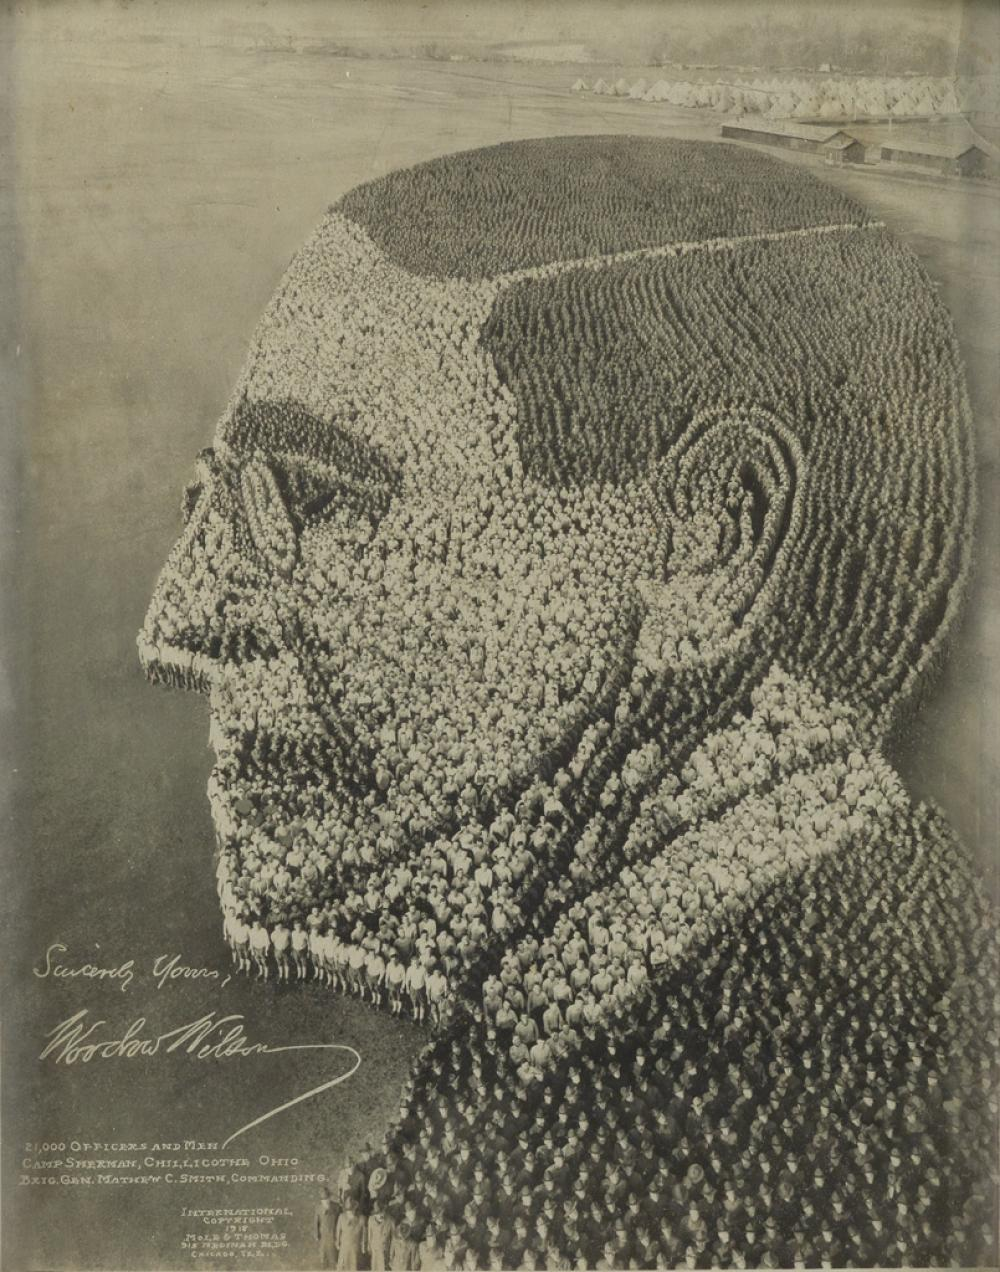 ARTHUR MOLE (1889-1983) & JOHN THOMAS (active 1918-1919) Woodrow Wilson, 21,000 Officers and Men, Camp Sherman, Chillicothe Ohio, Brig.